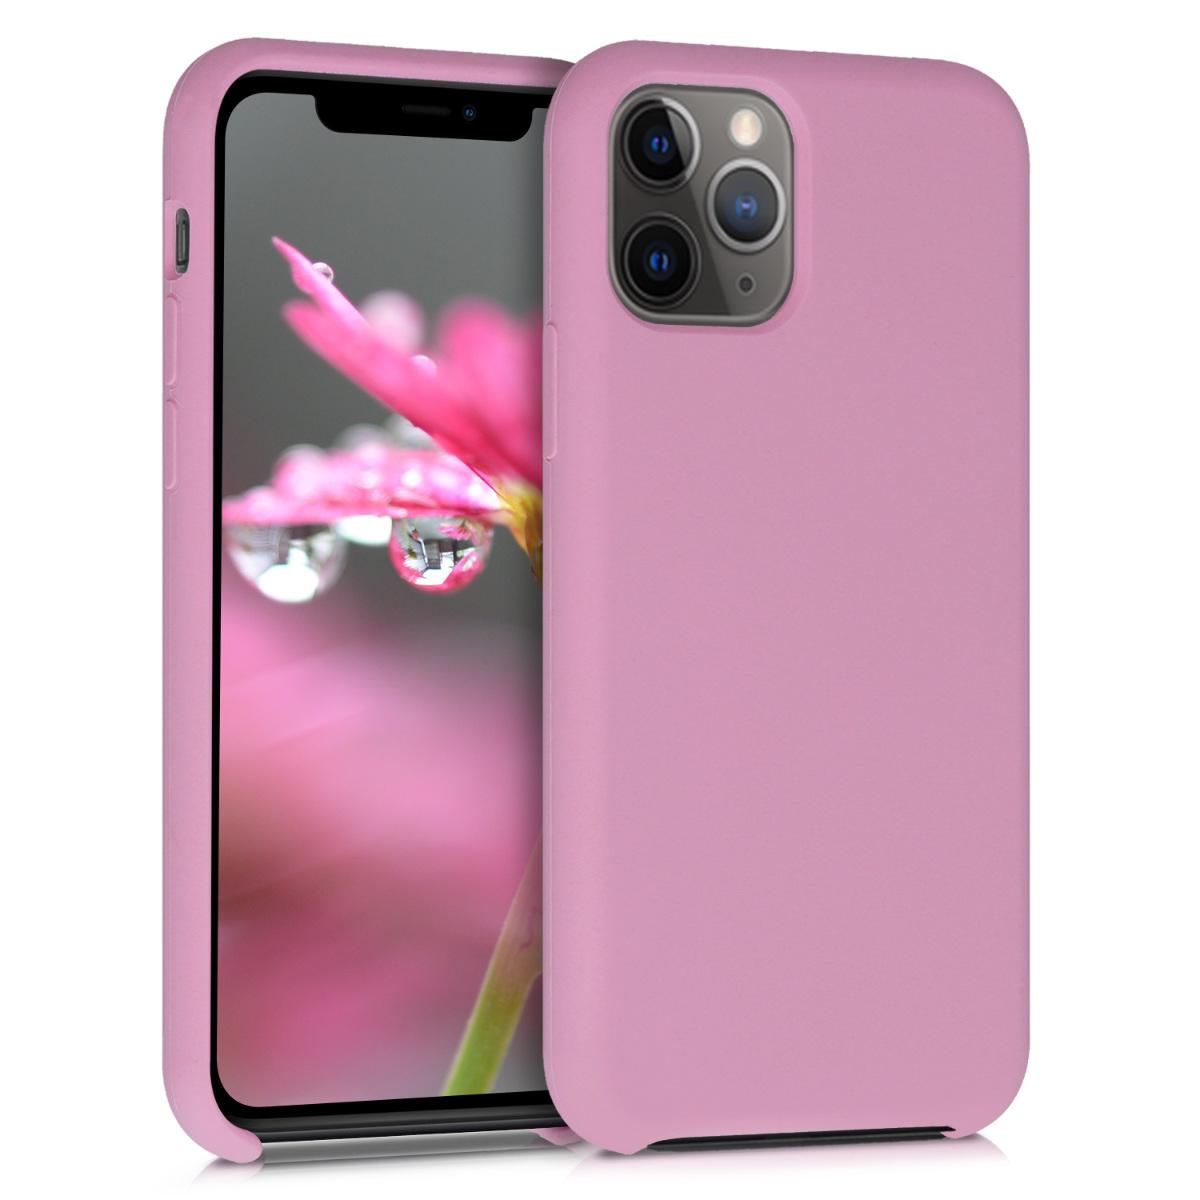 KW Θήκη Σιλικόνης Apple iPhone 11 Pro Max - Soft Flexible Rubber - Mulberry (49725.151)